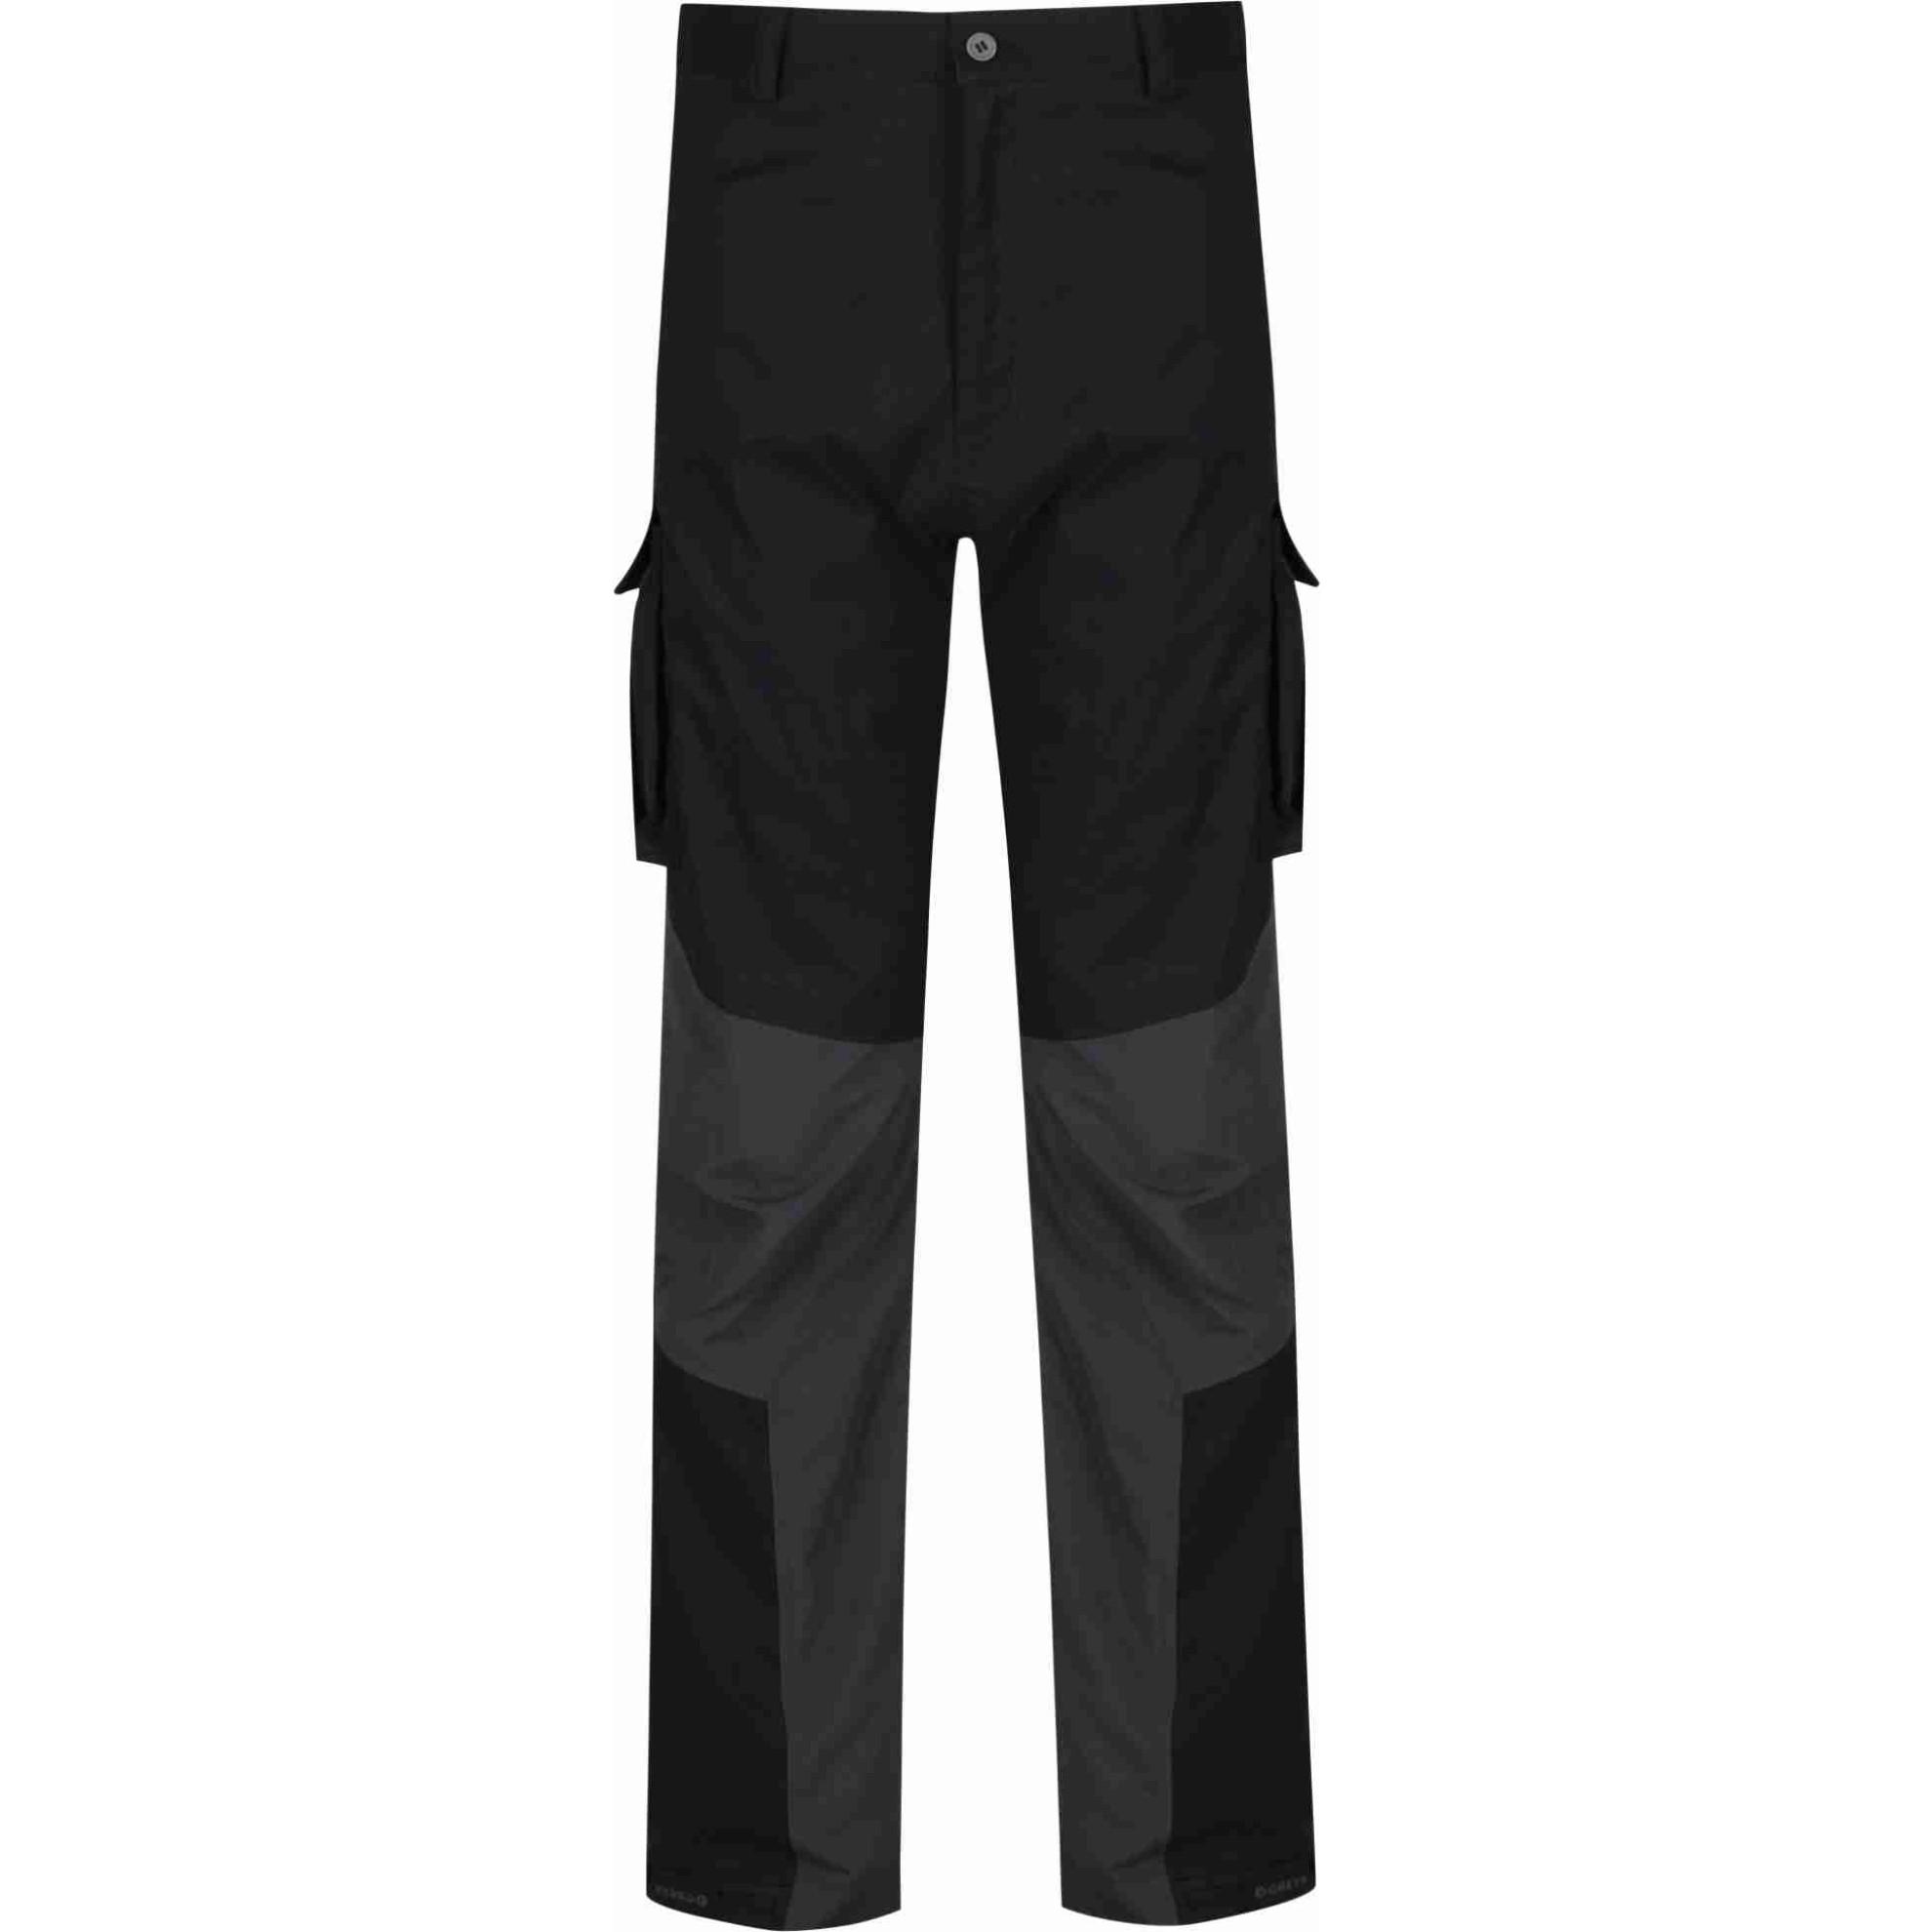 Hosen & Shorts Simply Savage Trousers XL Angelsport Savage Gear Angelbekleidung